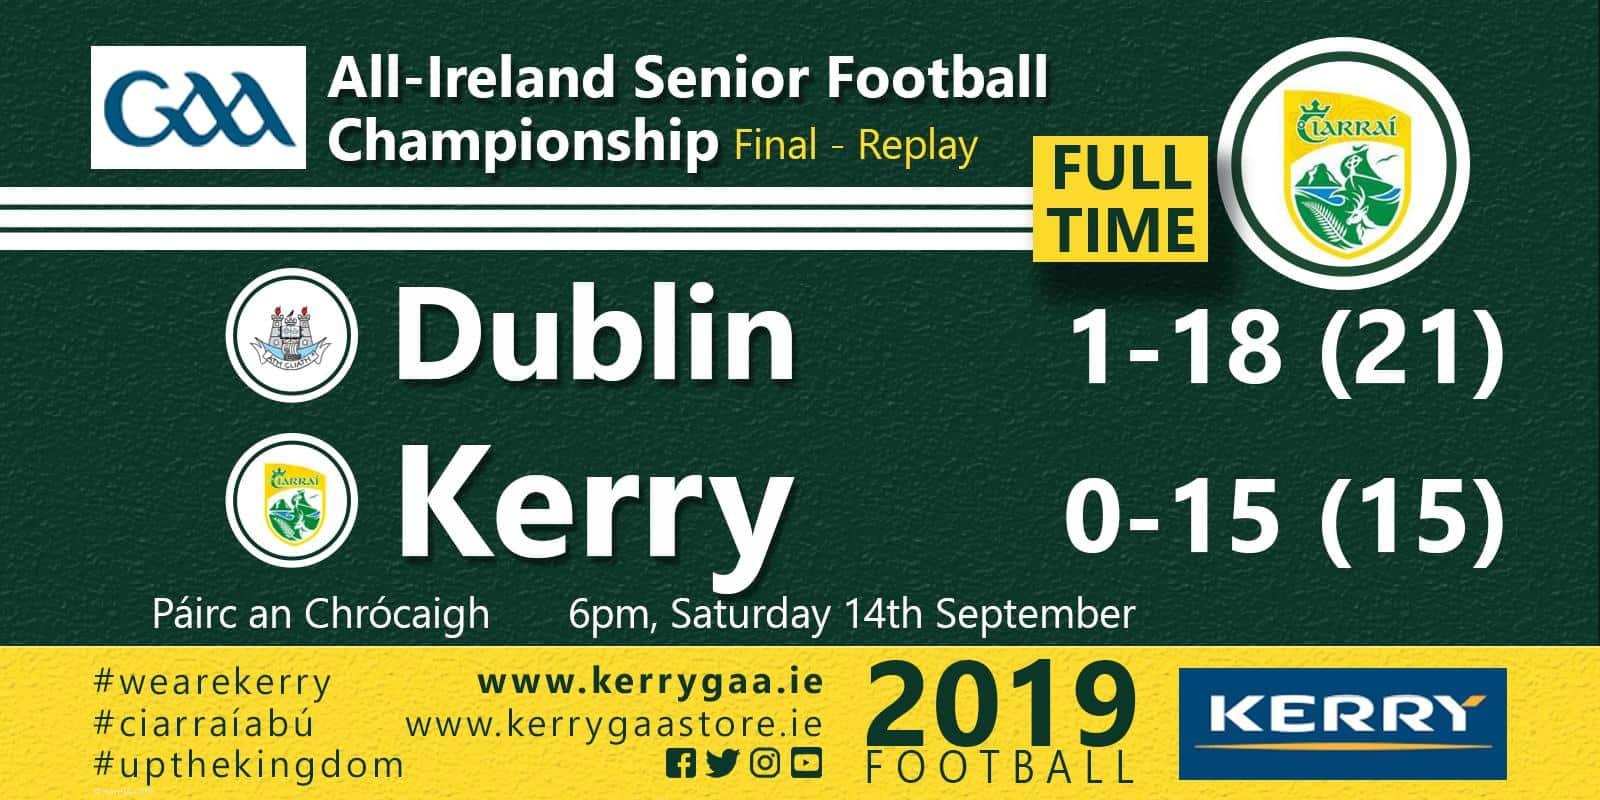 No joy for Kerry as Dublin retain title